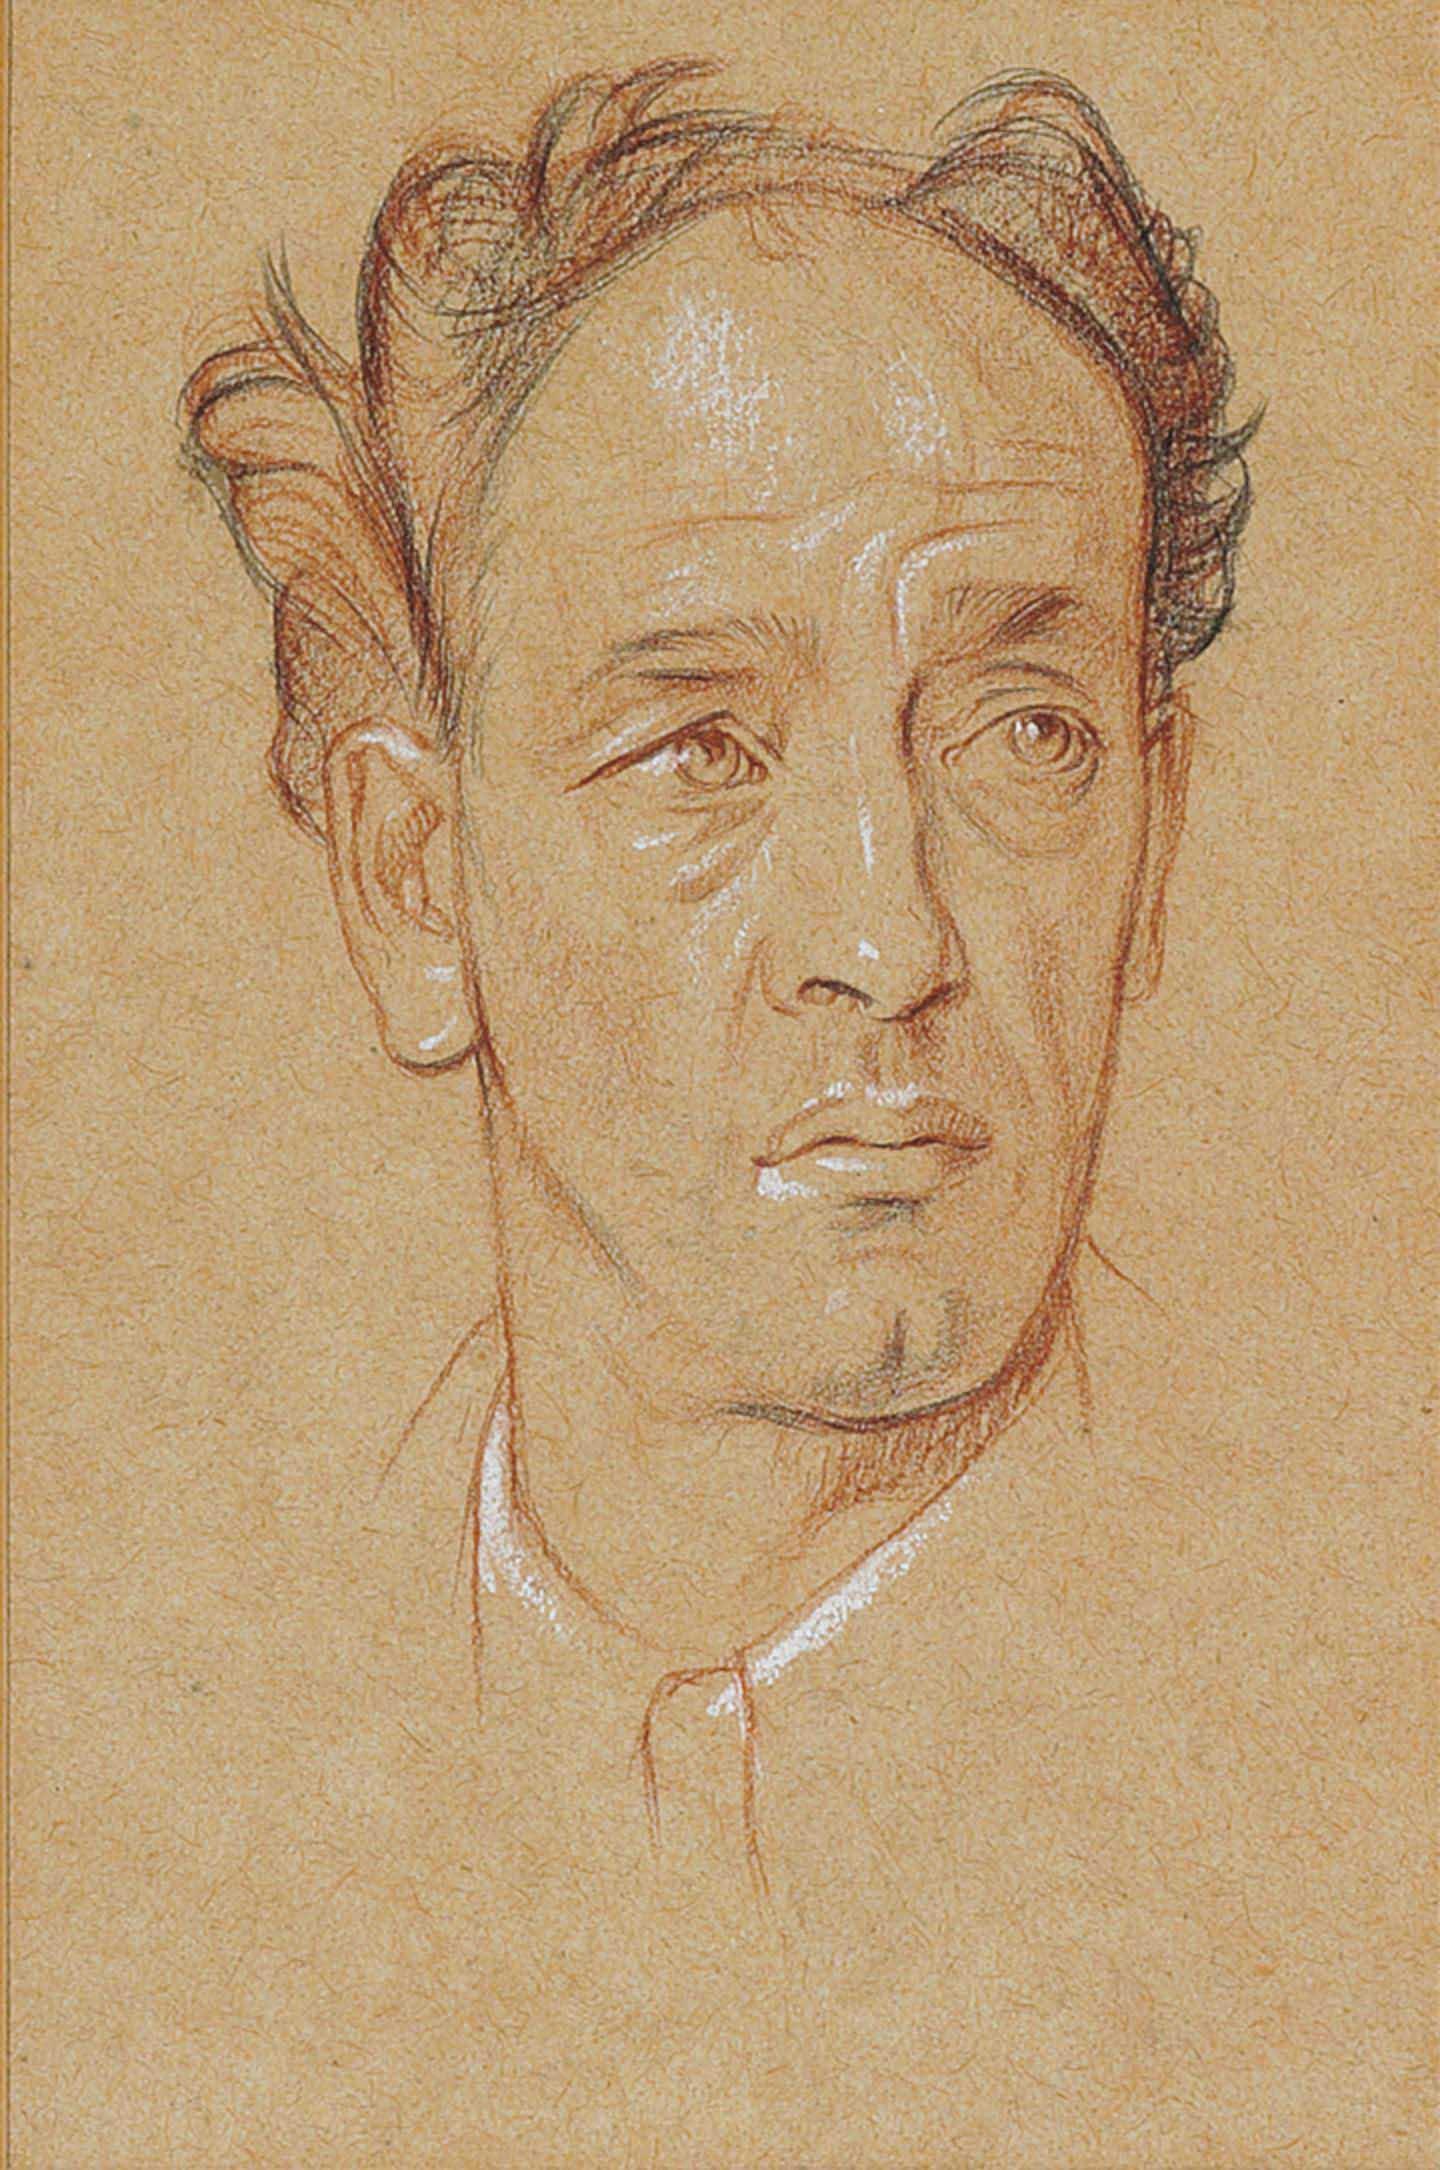 Portrait head of James Stephens (1882-1950)